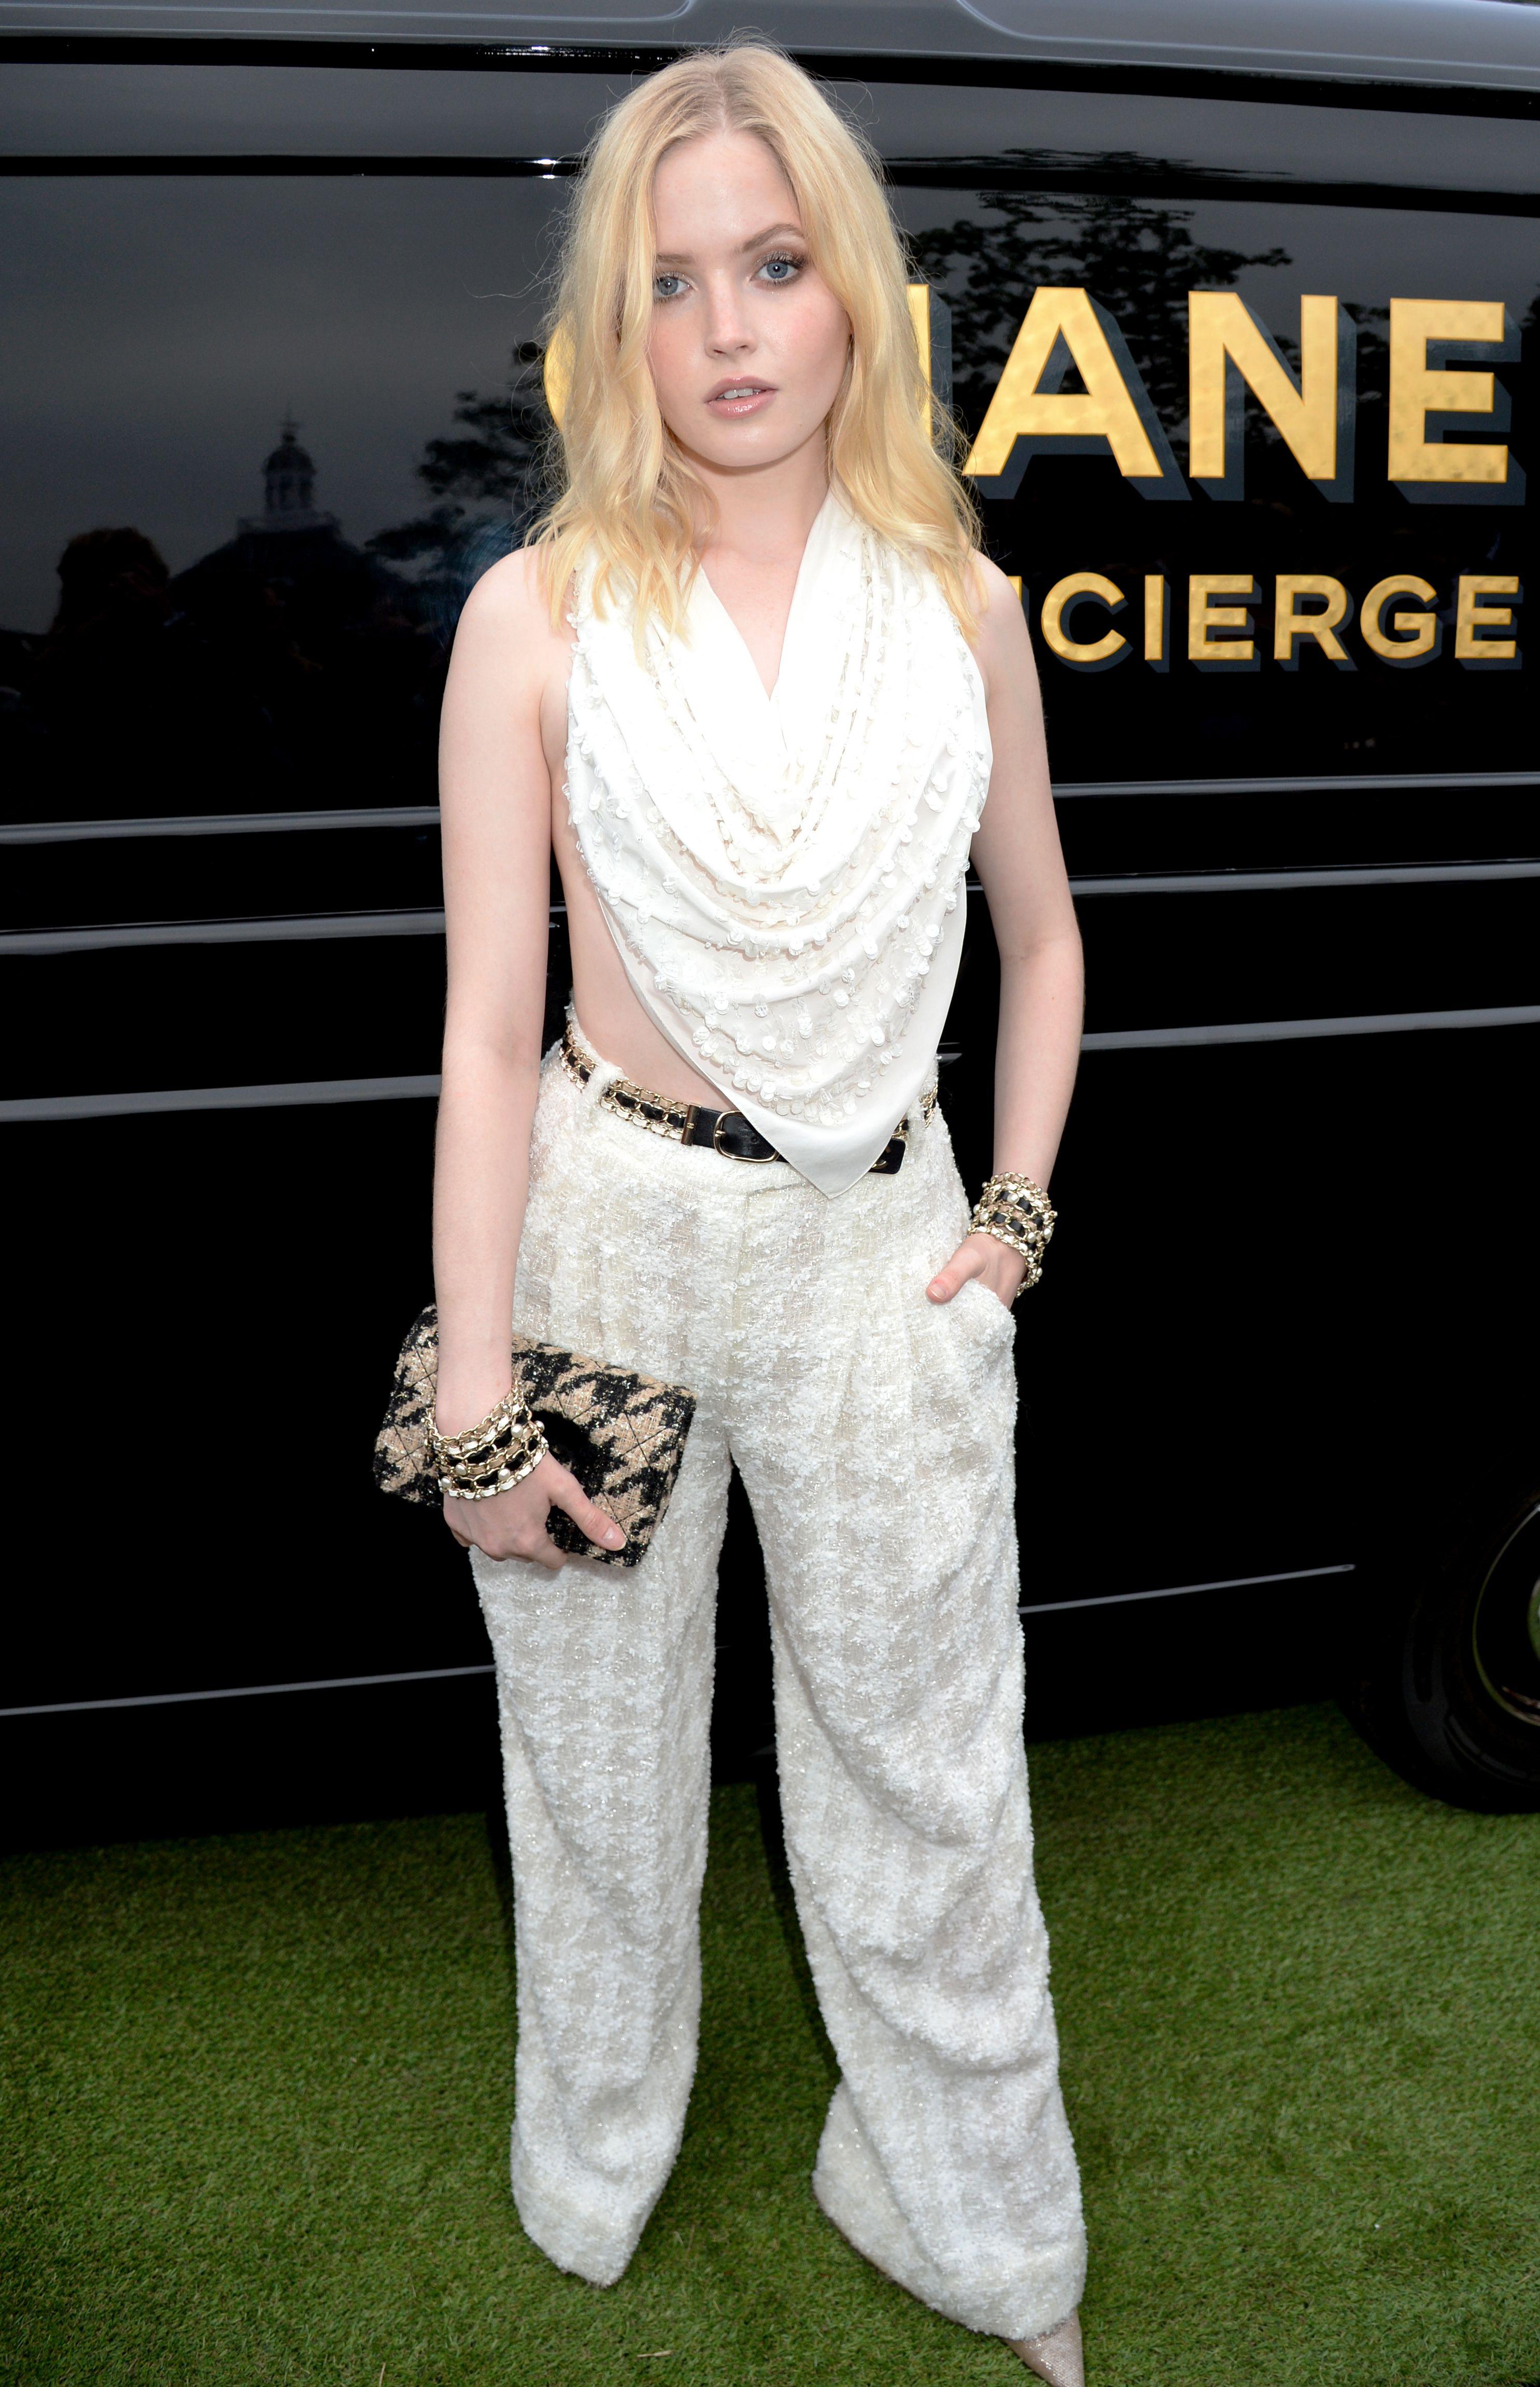 Ellie BamberSerpentine Gallery Summer Party, Kensington Gardens, London, UK - 25 Jun 2019Wearing Chanel same outfit as catwalk model *10129489dd